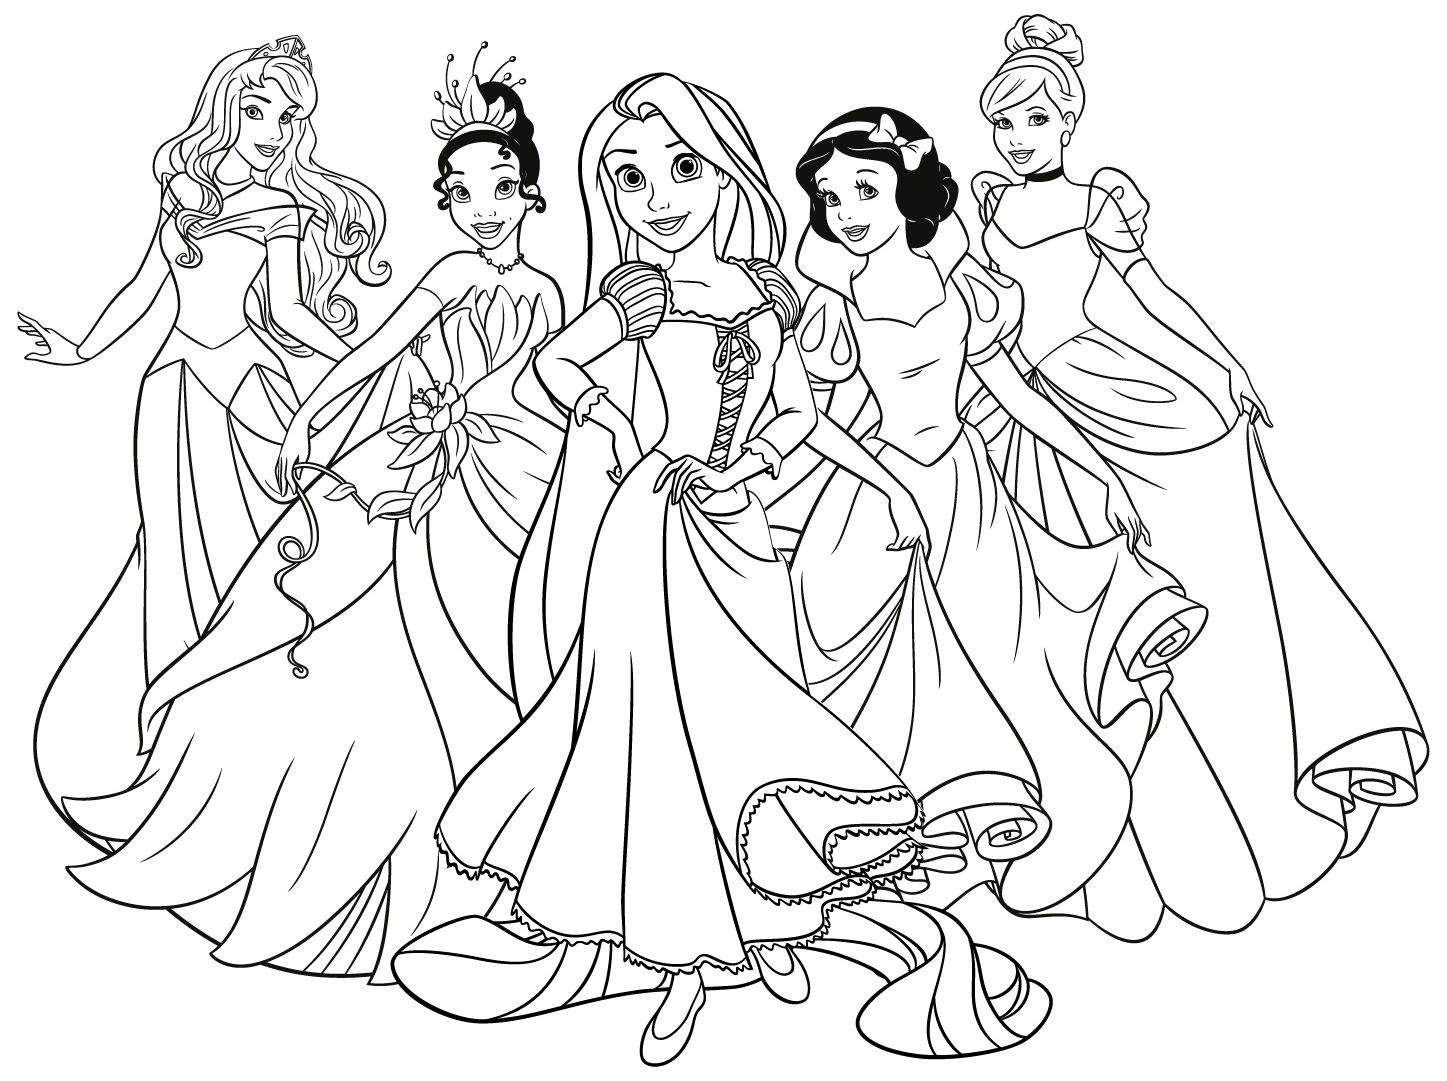 Similiar Dibujos Para Colorear E Imprimir De Disney Keywords